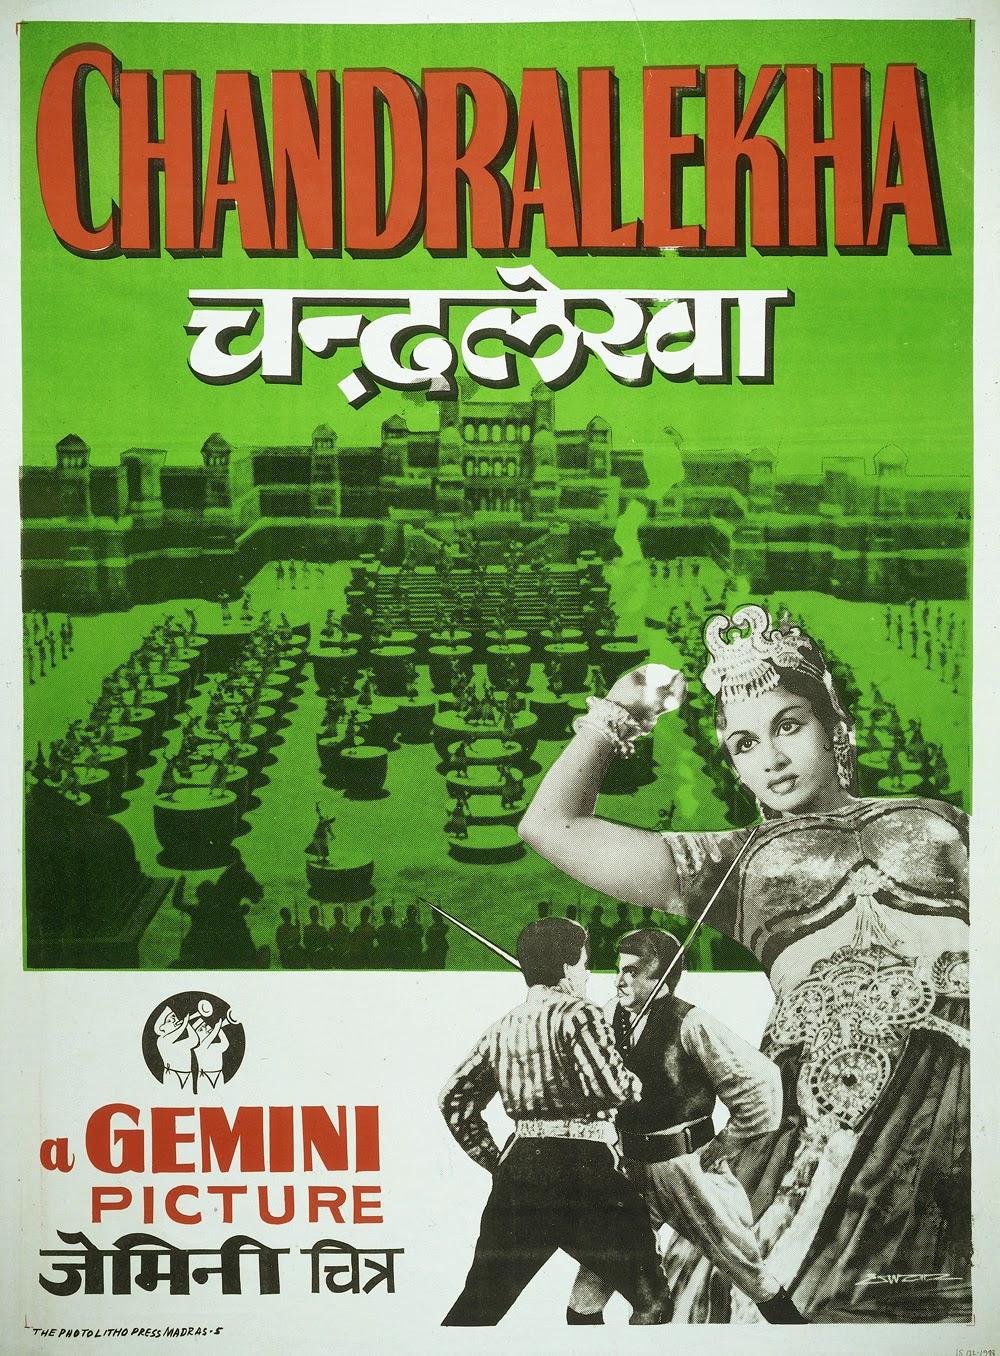 tamil Chandralekha movie